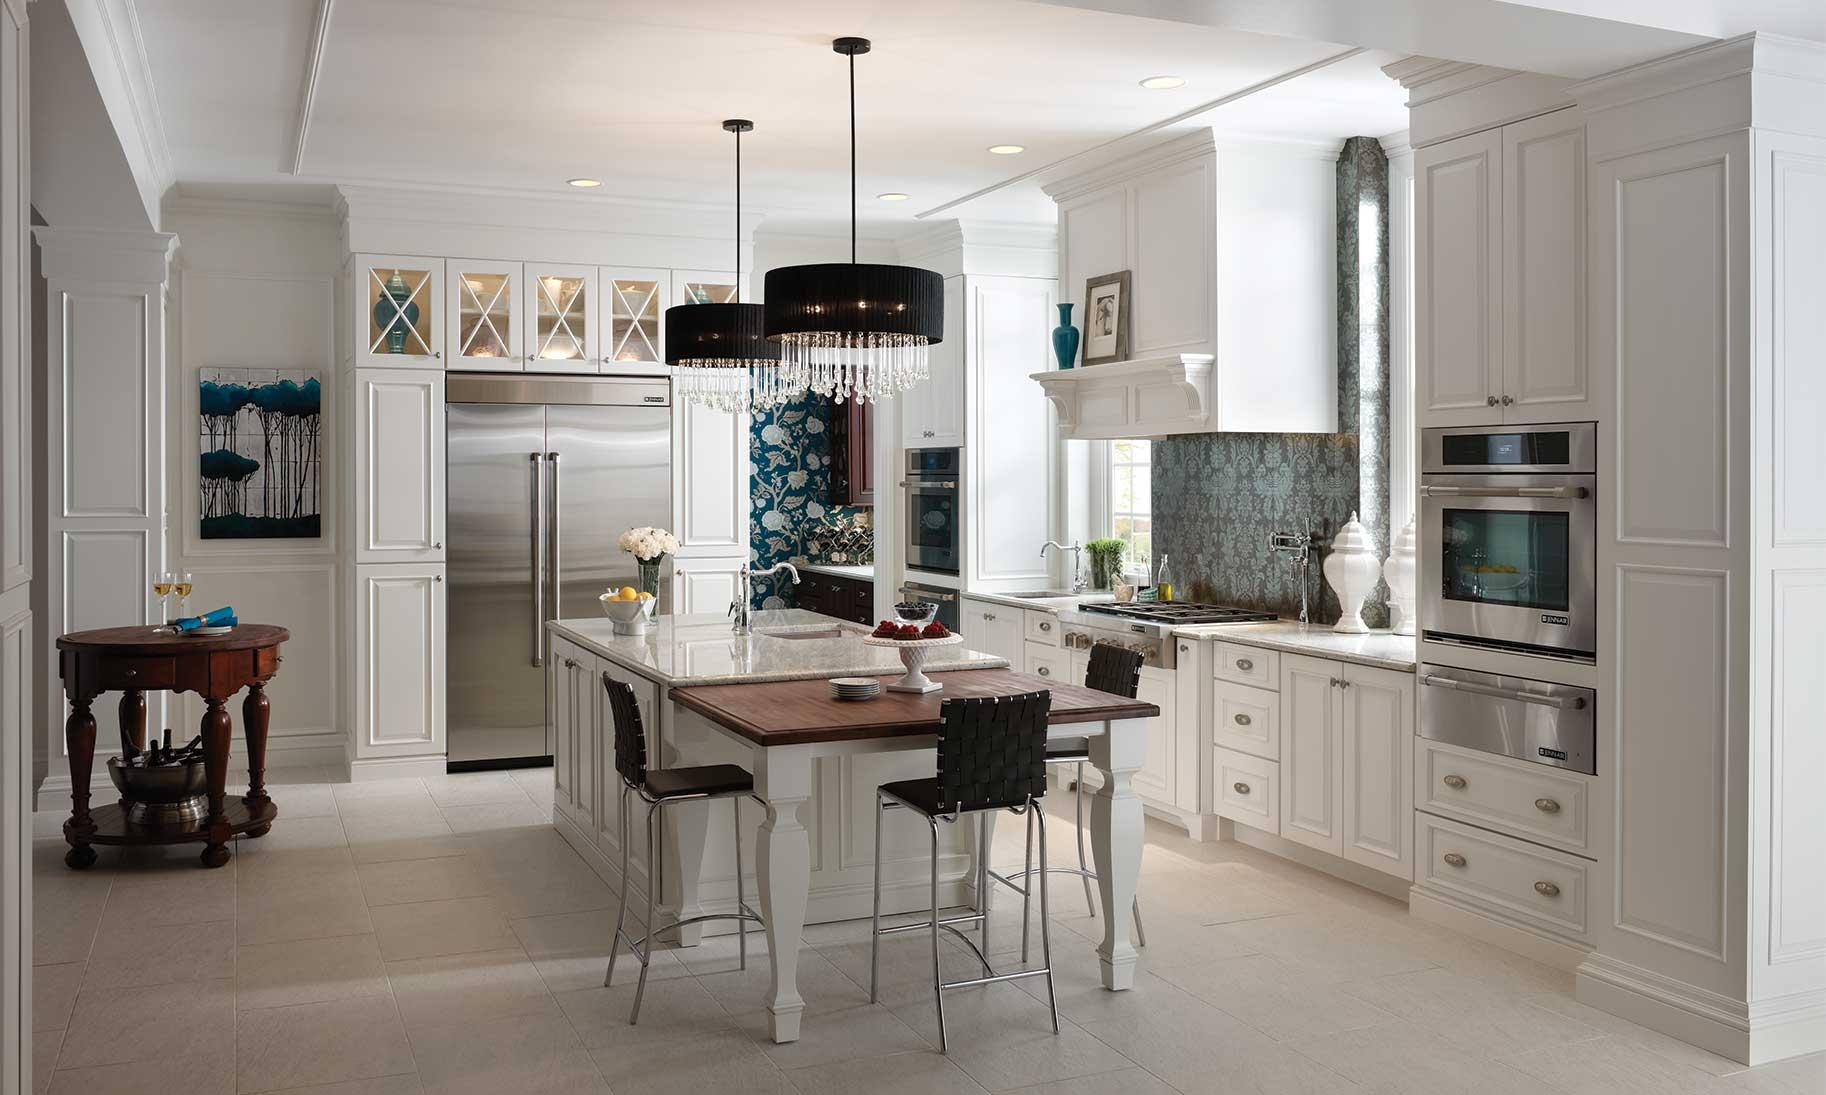 masterstouchkbw kitchen and bath design Your dream kitchen and bathroom design team